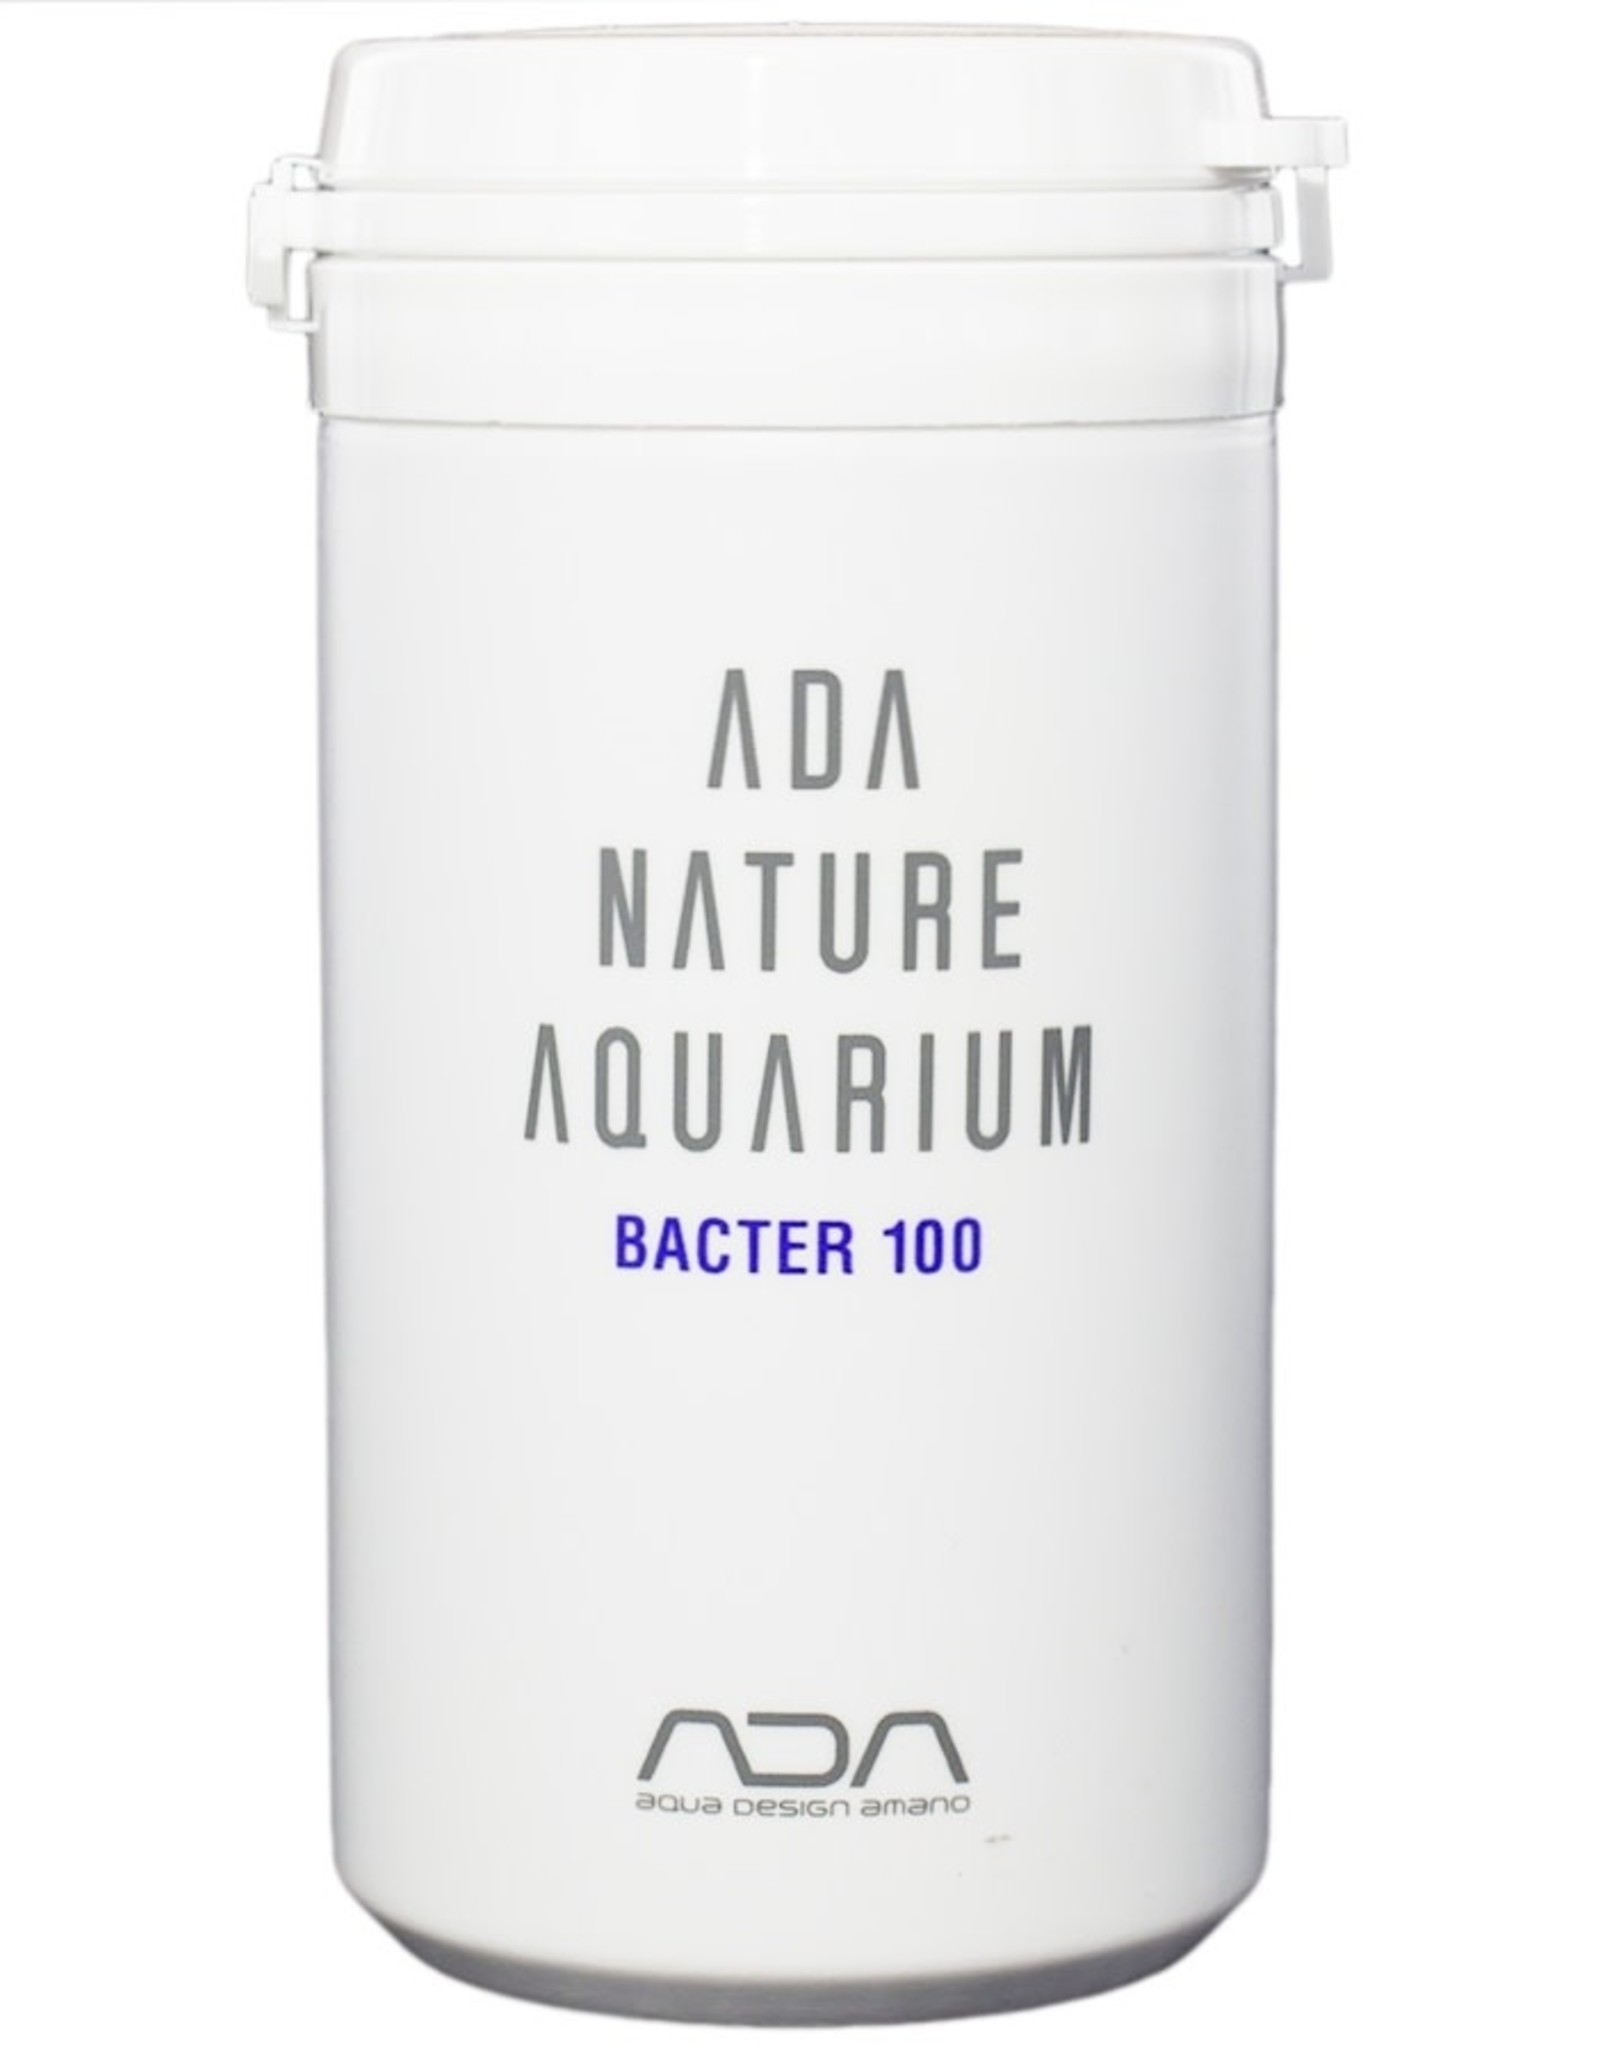 ADA Bacter 100 (100 g)